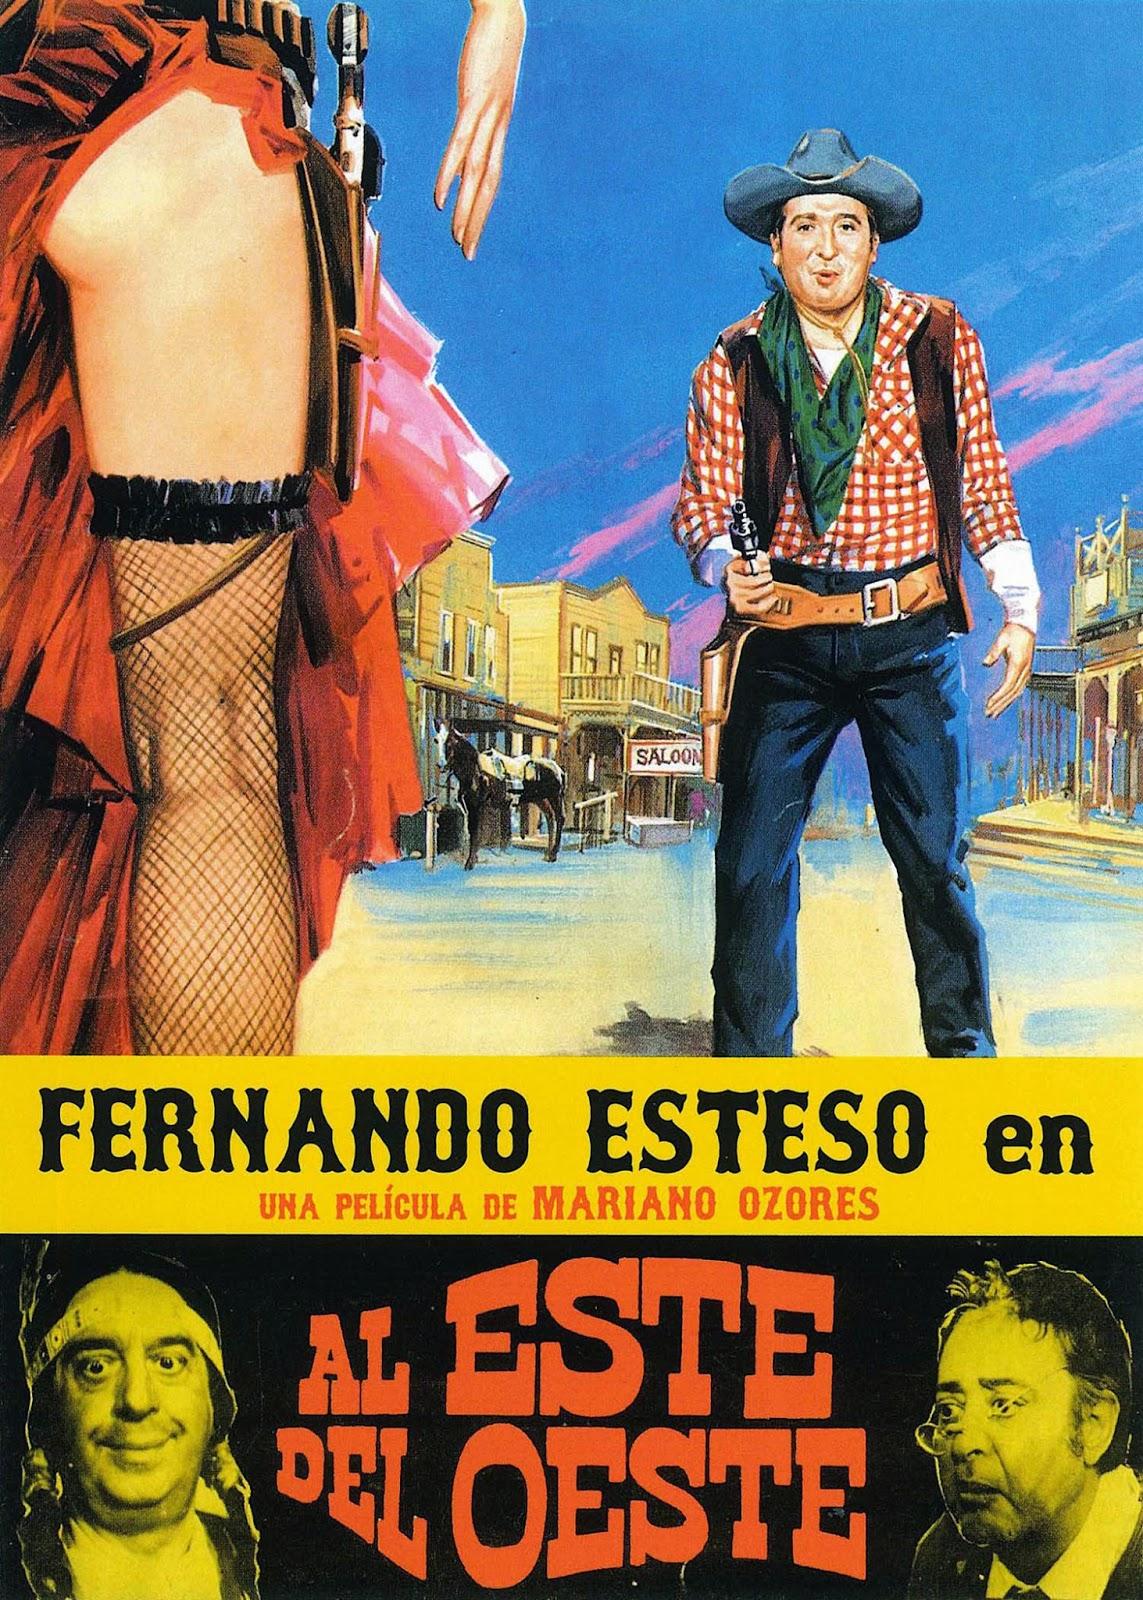 Al este del oeste (1984)